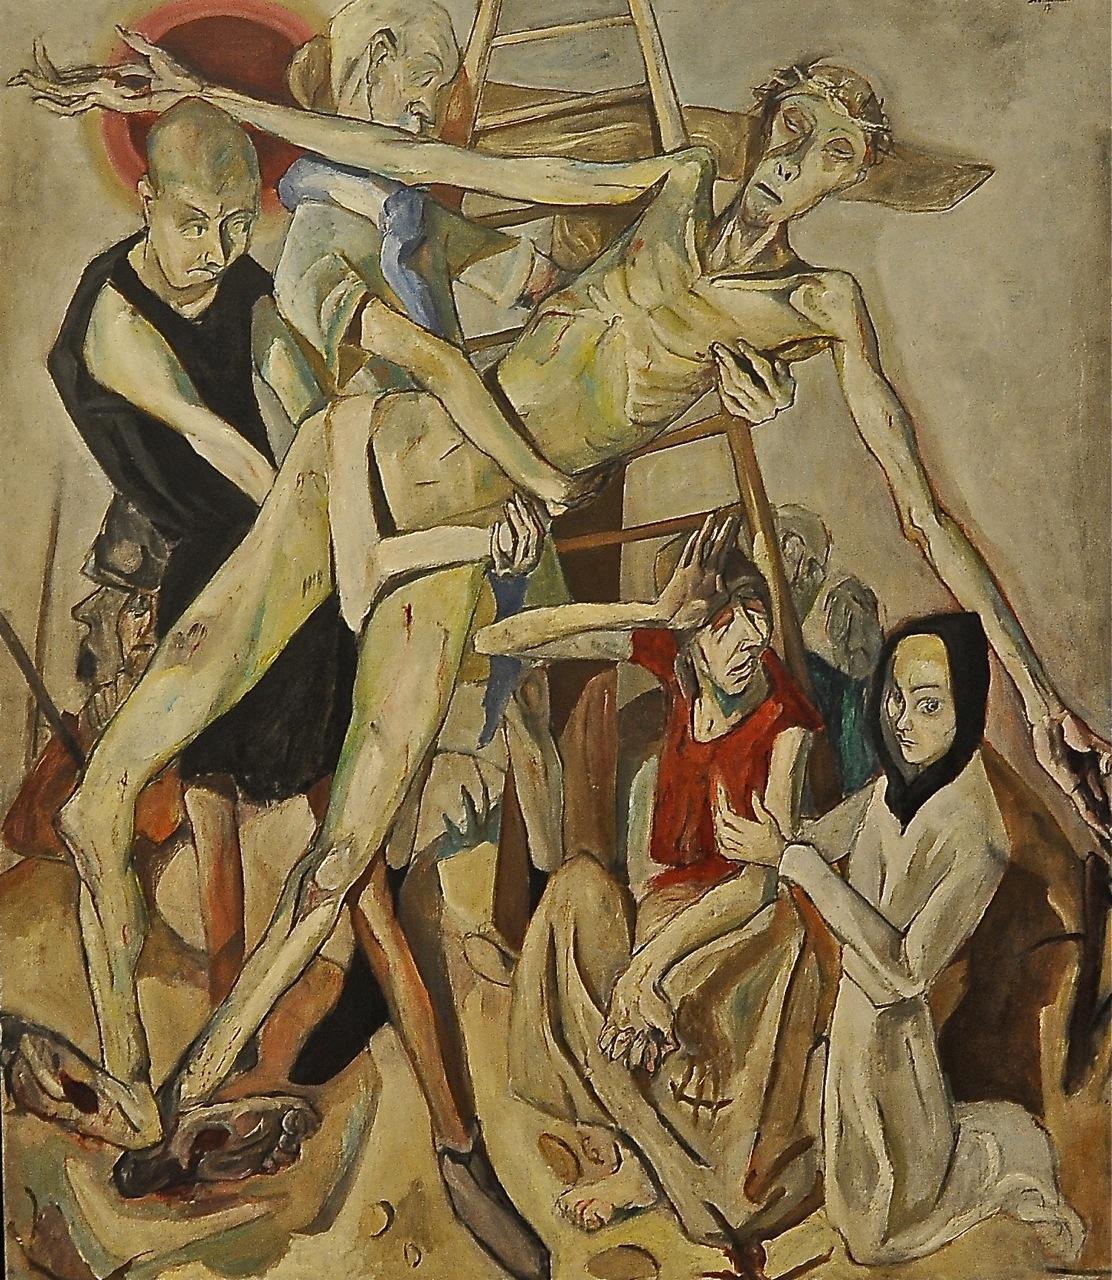 Descendimiento de la Cruz de Max Beckmann (1884-1950) MOMA New York. Foto de Oscar Tenreiro